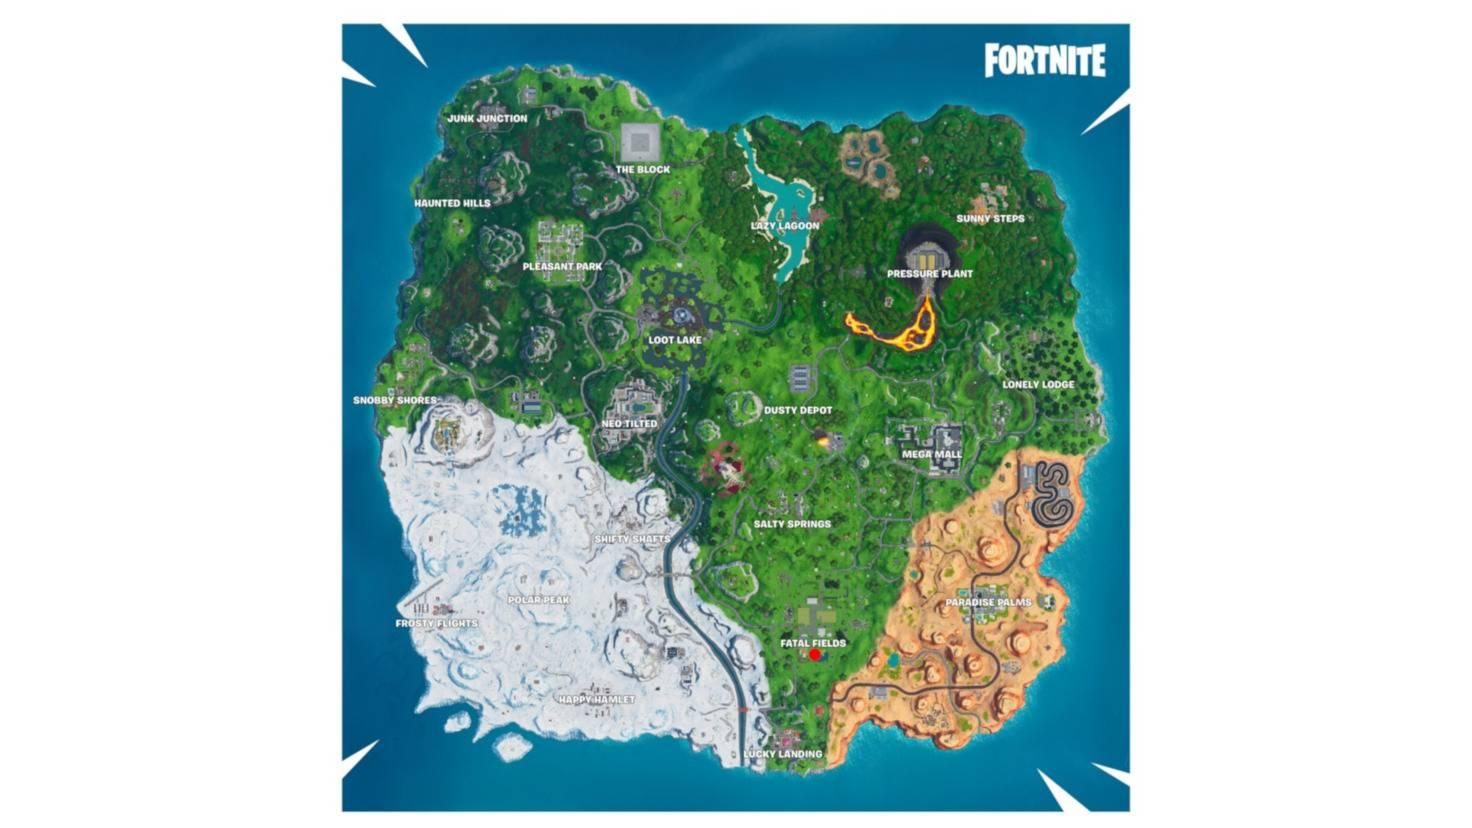 fortnite-map-season-10-battle-star-woche-6